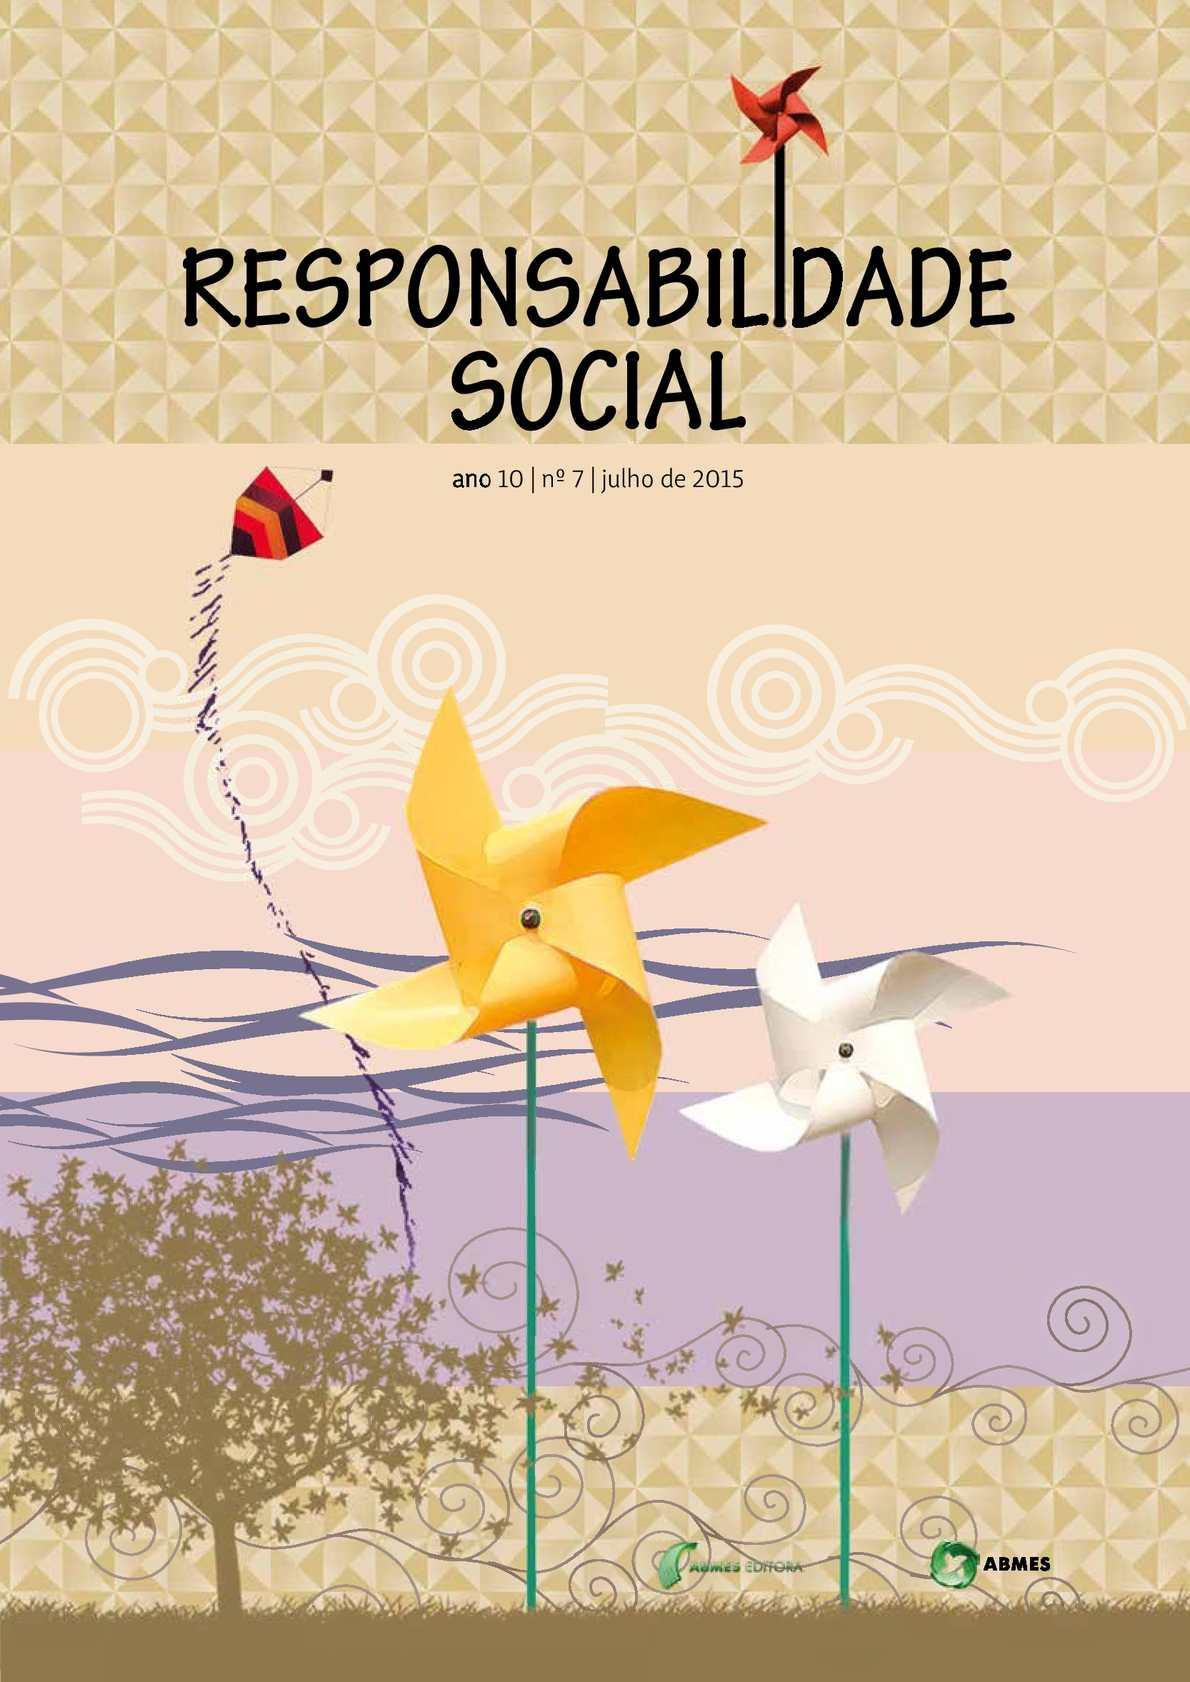 af41f5b1bb Calaméo - Revista Responsabilidade Social 2013 - 2014